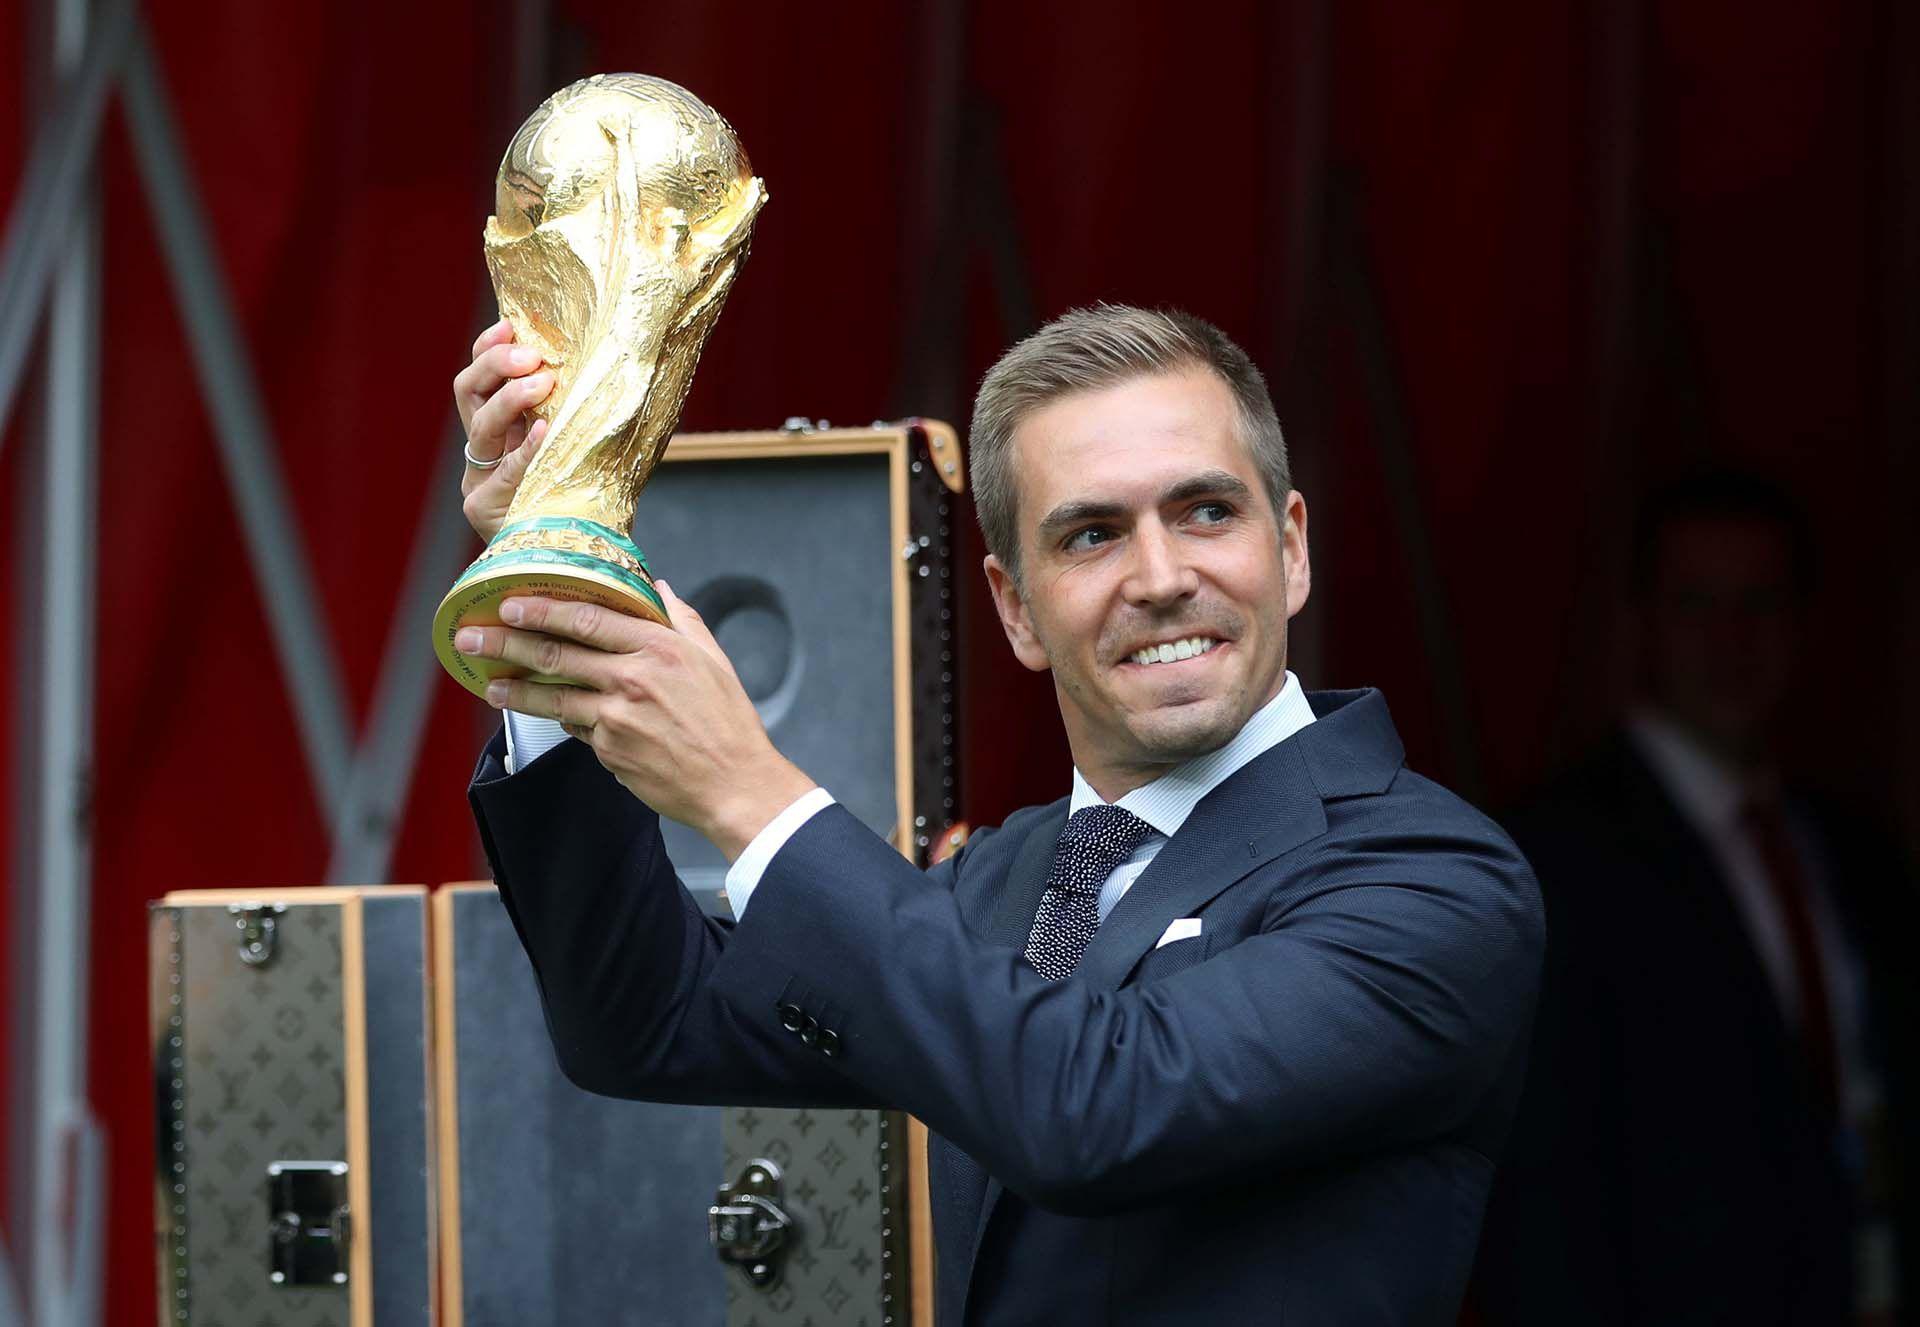 El alemán se consagró campeón del mundo al vencer a Argentina en la final del 2014 (Reuters)